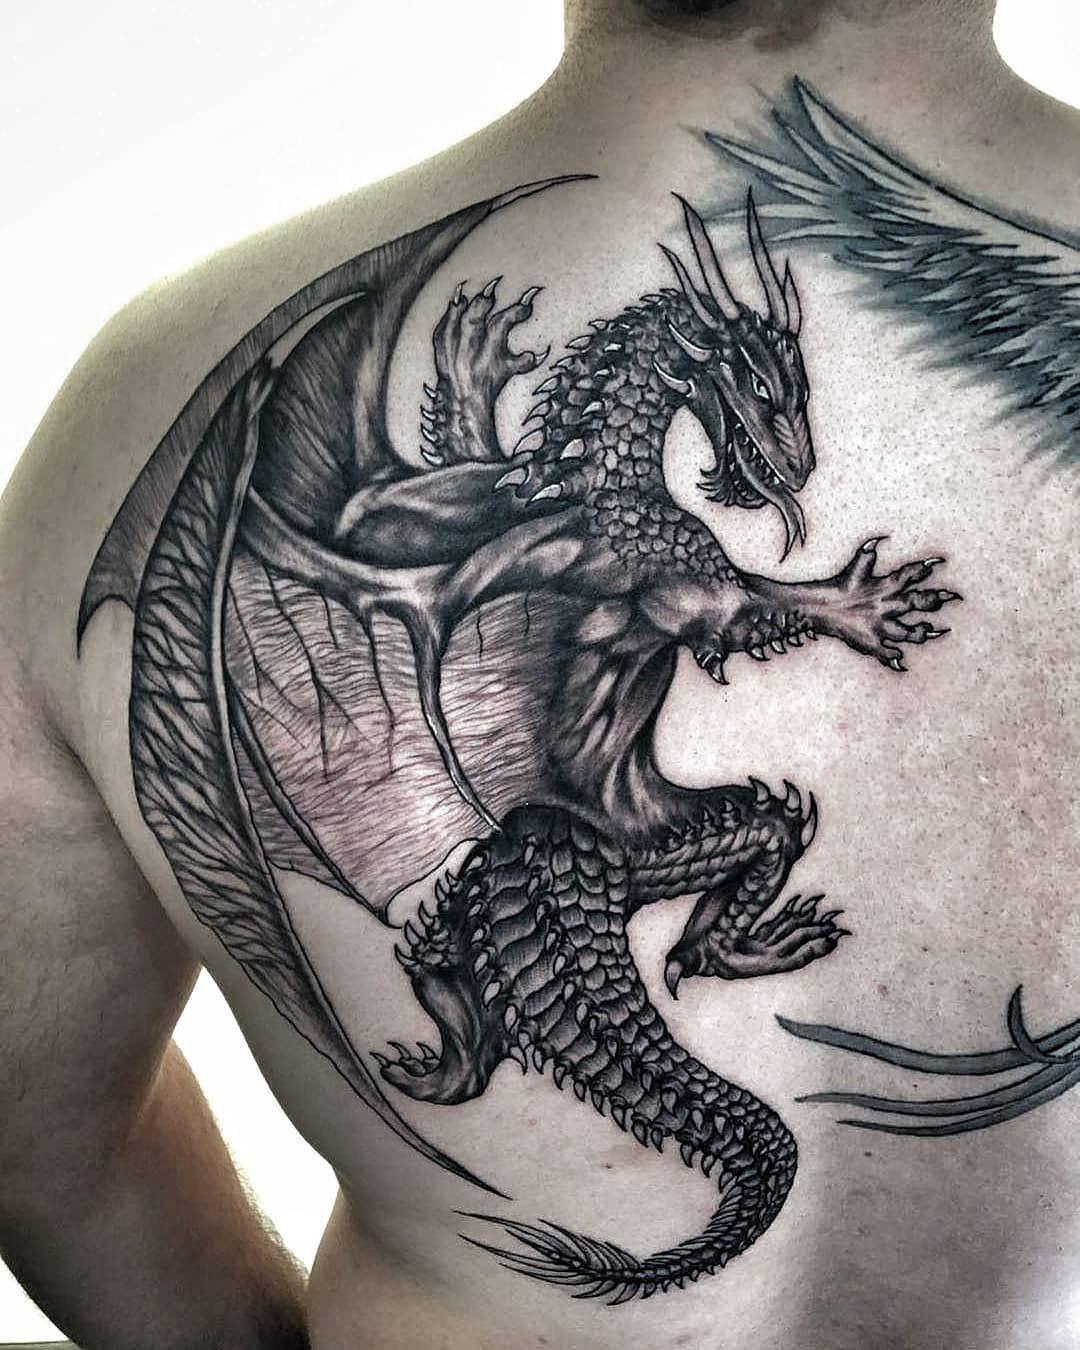 #tattoolife #tattooidea #tattooworkers #tattoomodels #tattoostyle #tattooink #tattooedmen #tattoodo #tattooing #tattoodesign #tattoosociety #tattooart #tattooed #tattoo #tattooist #tattooartist #tattooart #tattoos #dovmemodelleri #dovmeturkiye #dovmesanati #nişantaşı #beşiktaş #ortaköy #diyarbakir